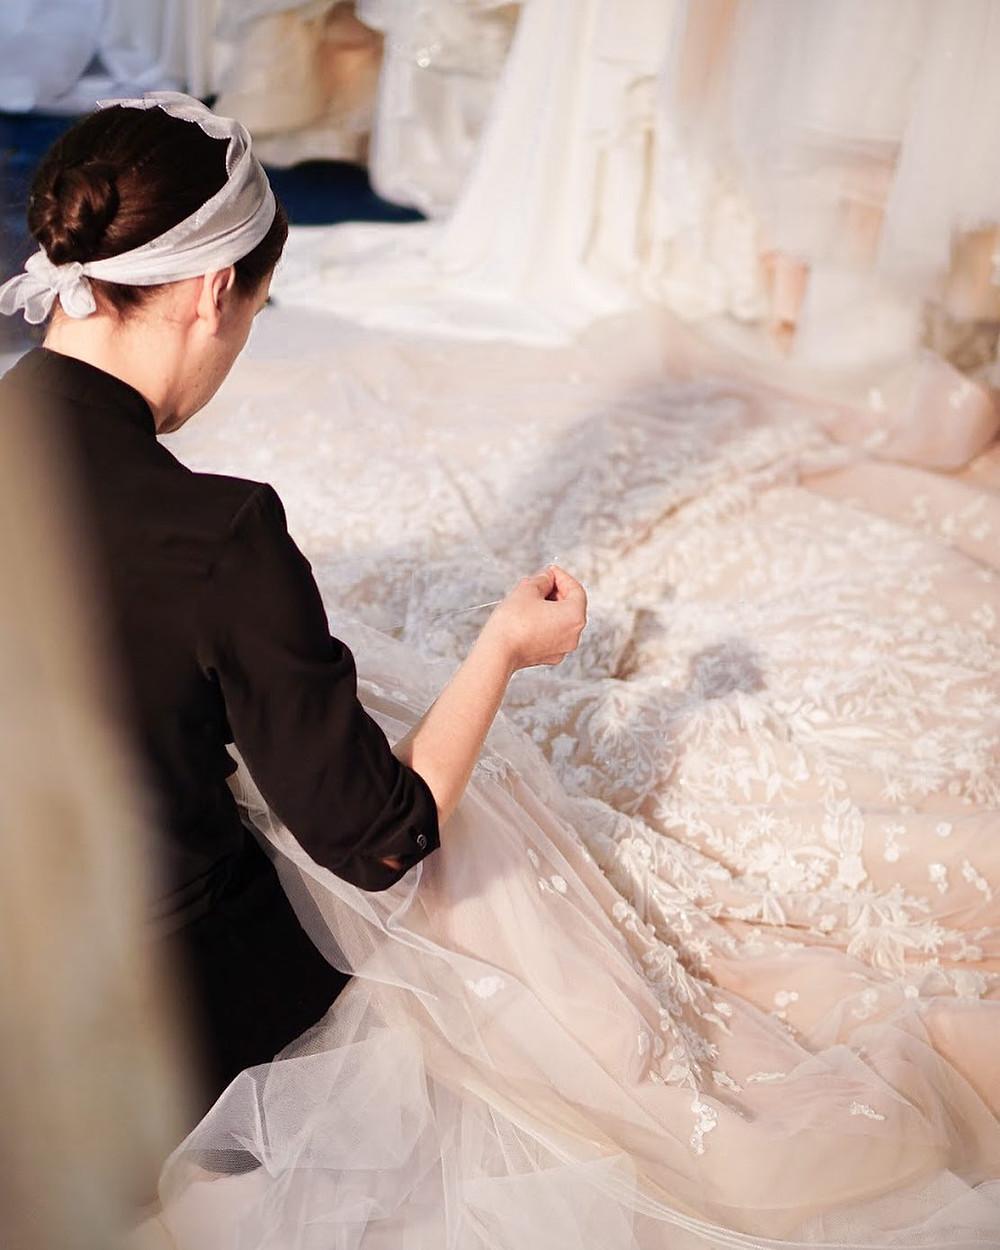 atelier rochii de mireasa, rochii de mireasa, rochii de mireasa bucuresti